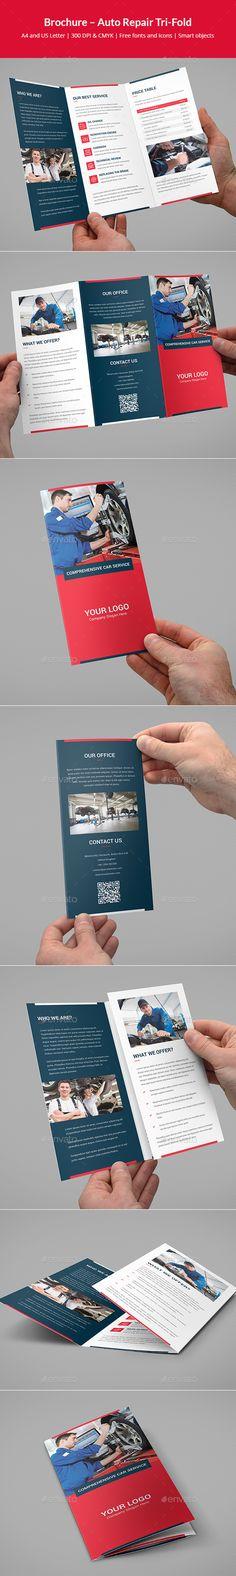 Brochure – Auto Repair Tri-Fold - #Corporate #Brochures Download here: https://graphicriver.net/item/brochure-auto-repair-trifold/19532311?ref=alena994